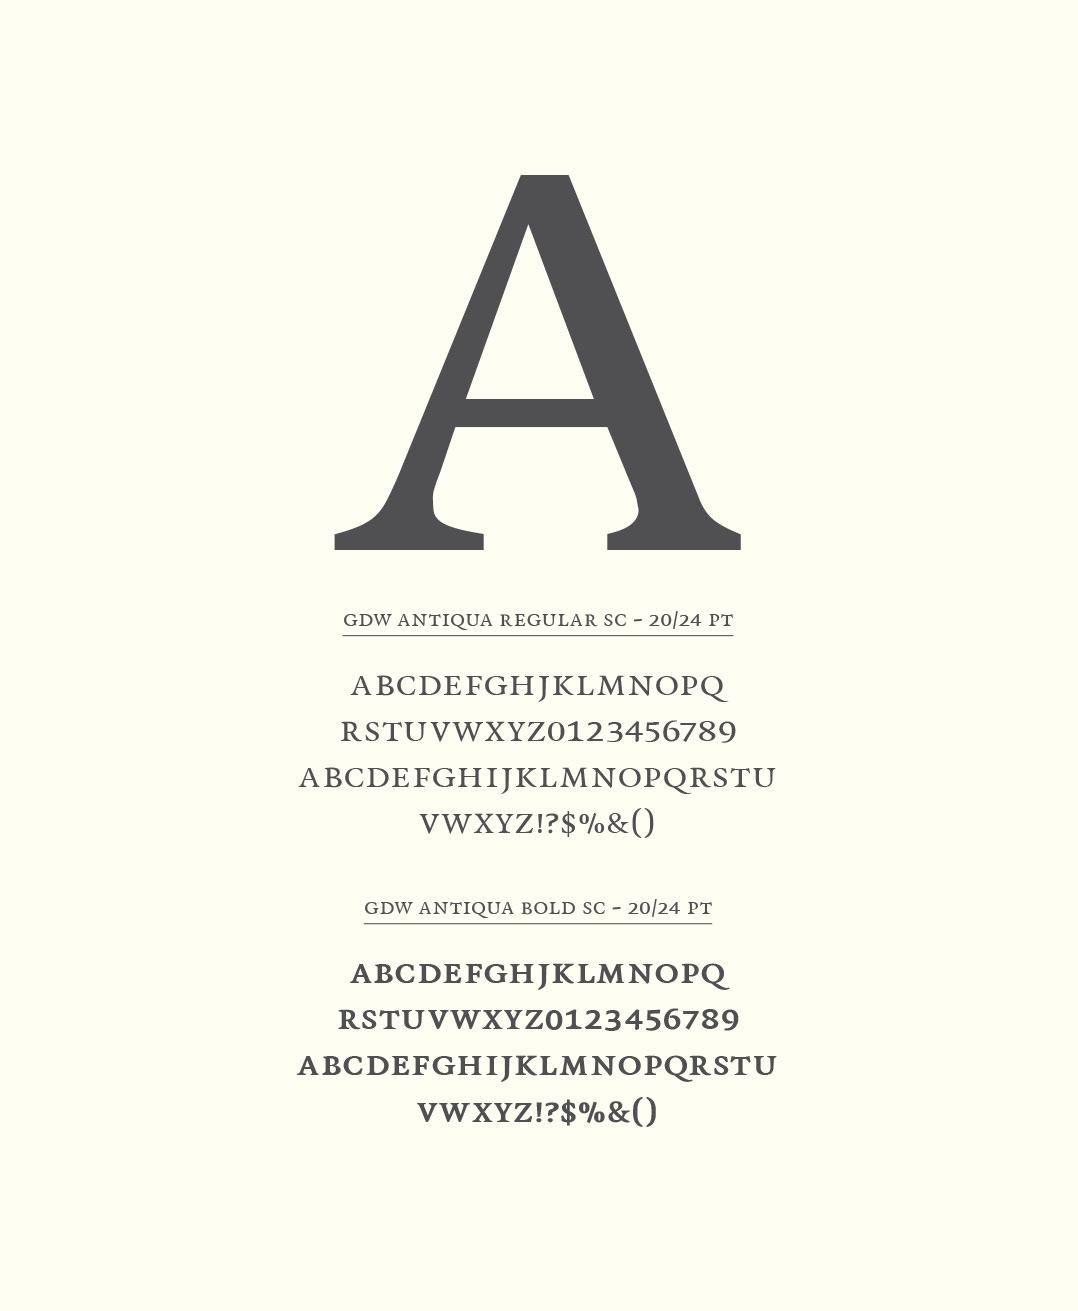 bergfest gesellschaft f r kommunikation mbh wempe typeface manual. Black Bedroom Furniture Sets. Home Design Ideas